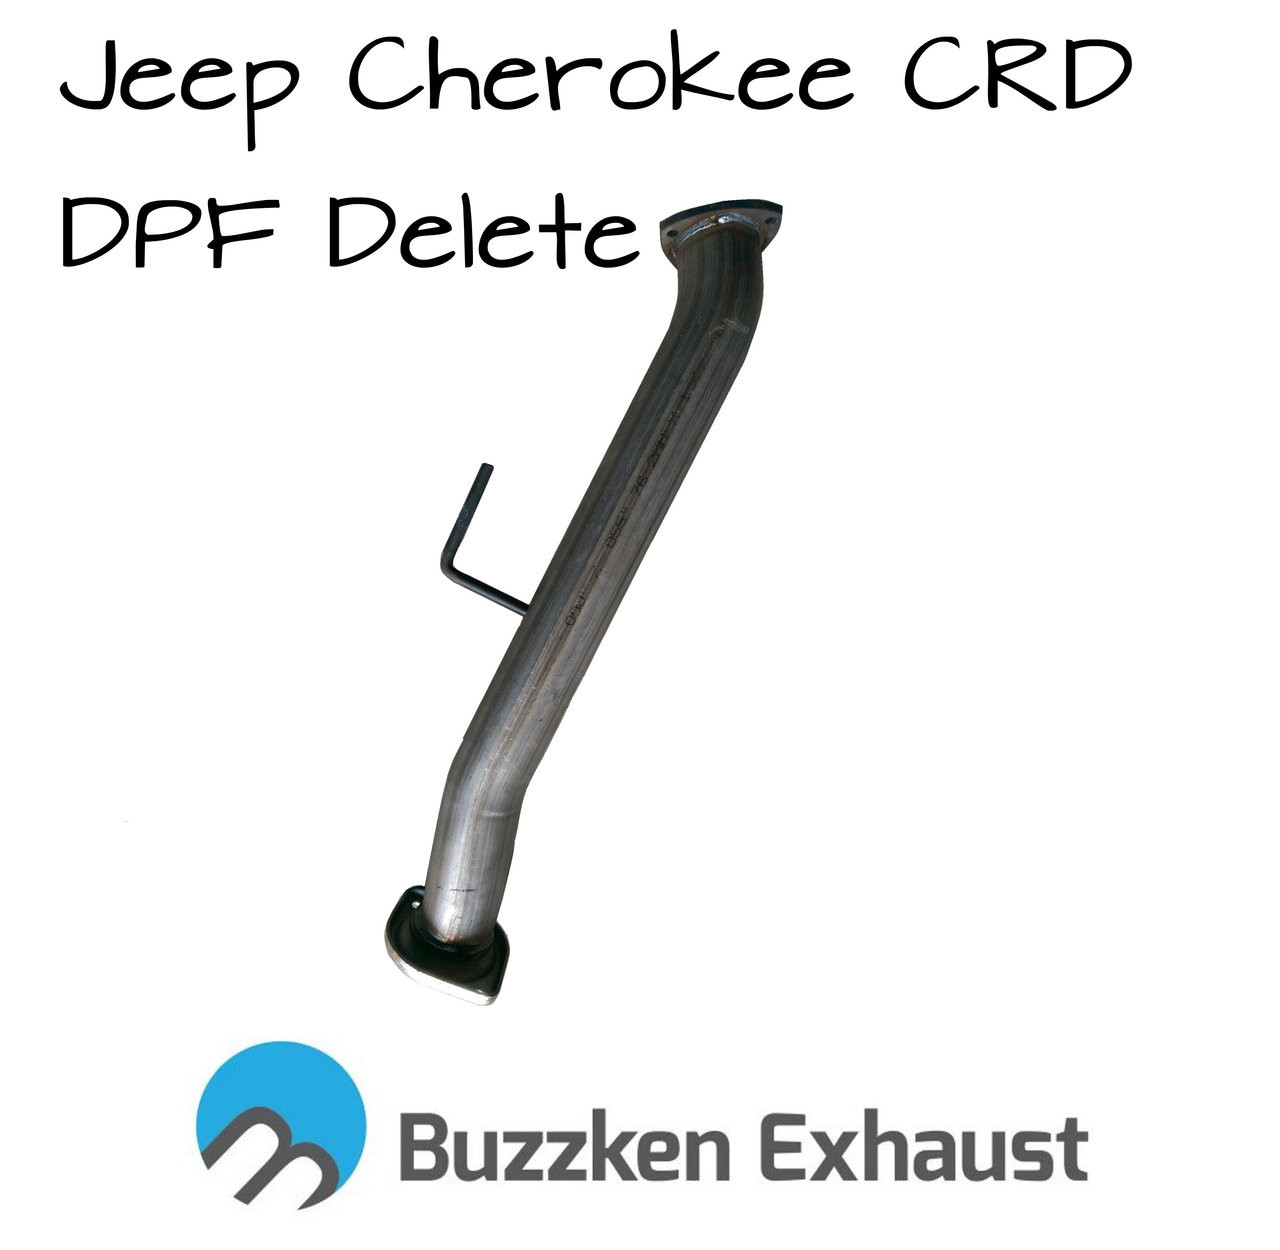 Cherokee '07-'08 crd dpf delete pipe - BuzzKen (buzz-crd-0708) - 1